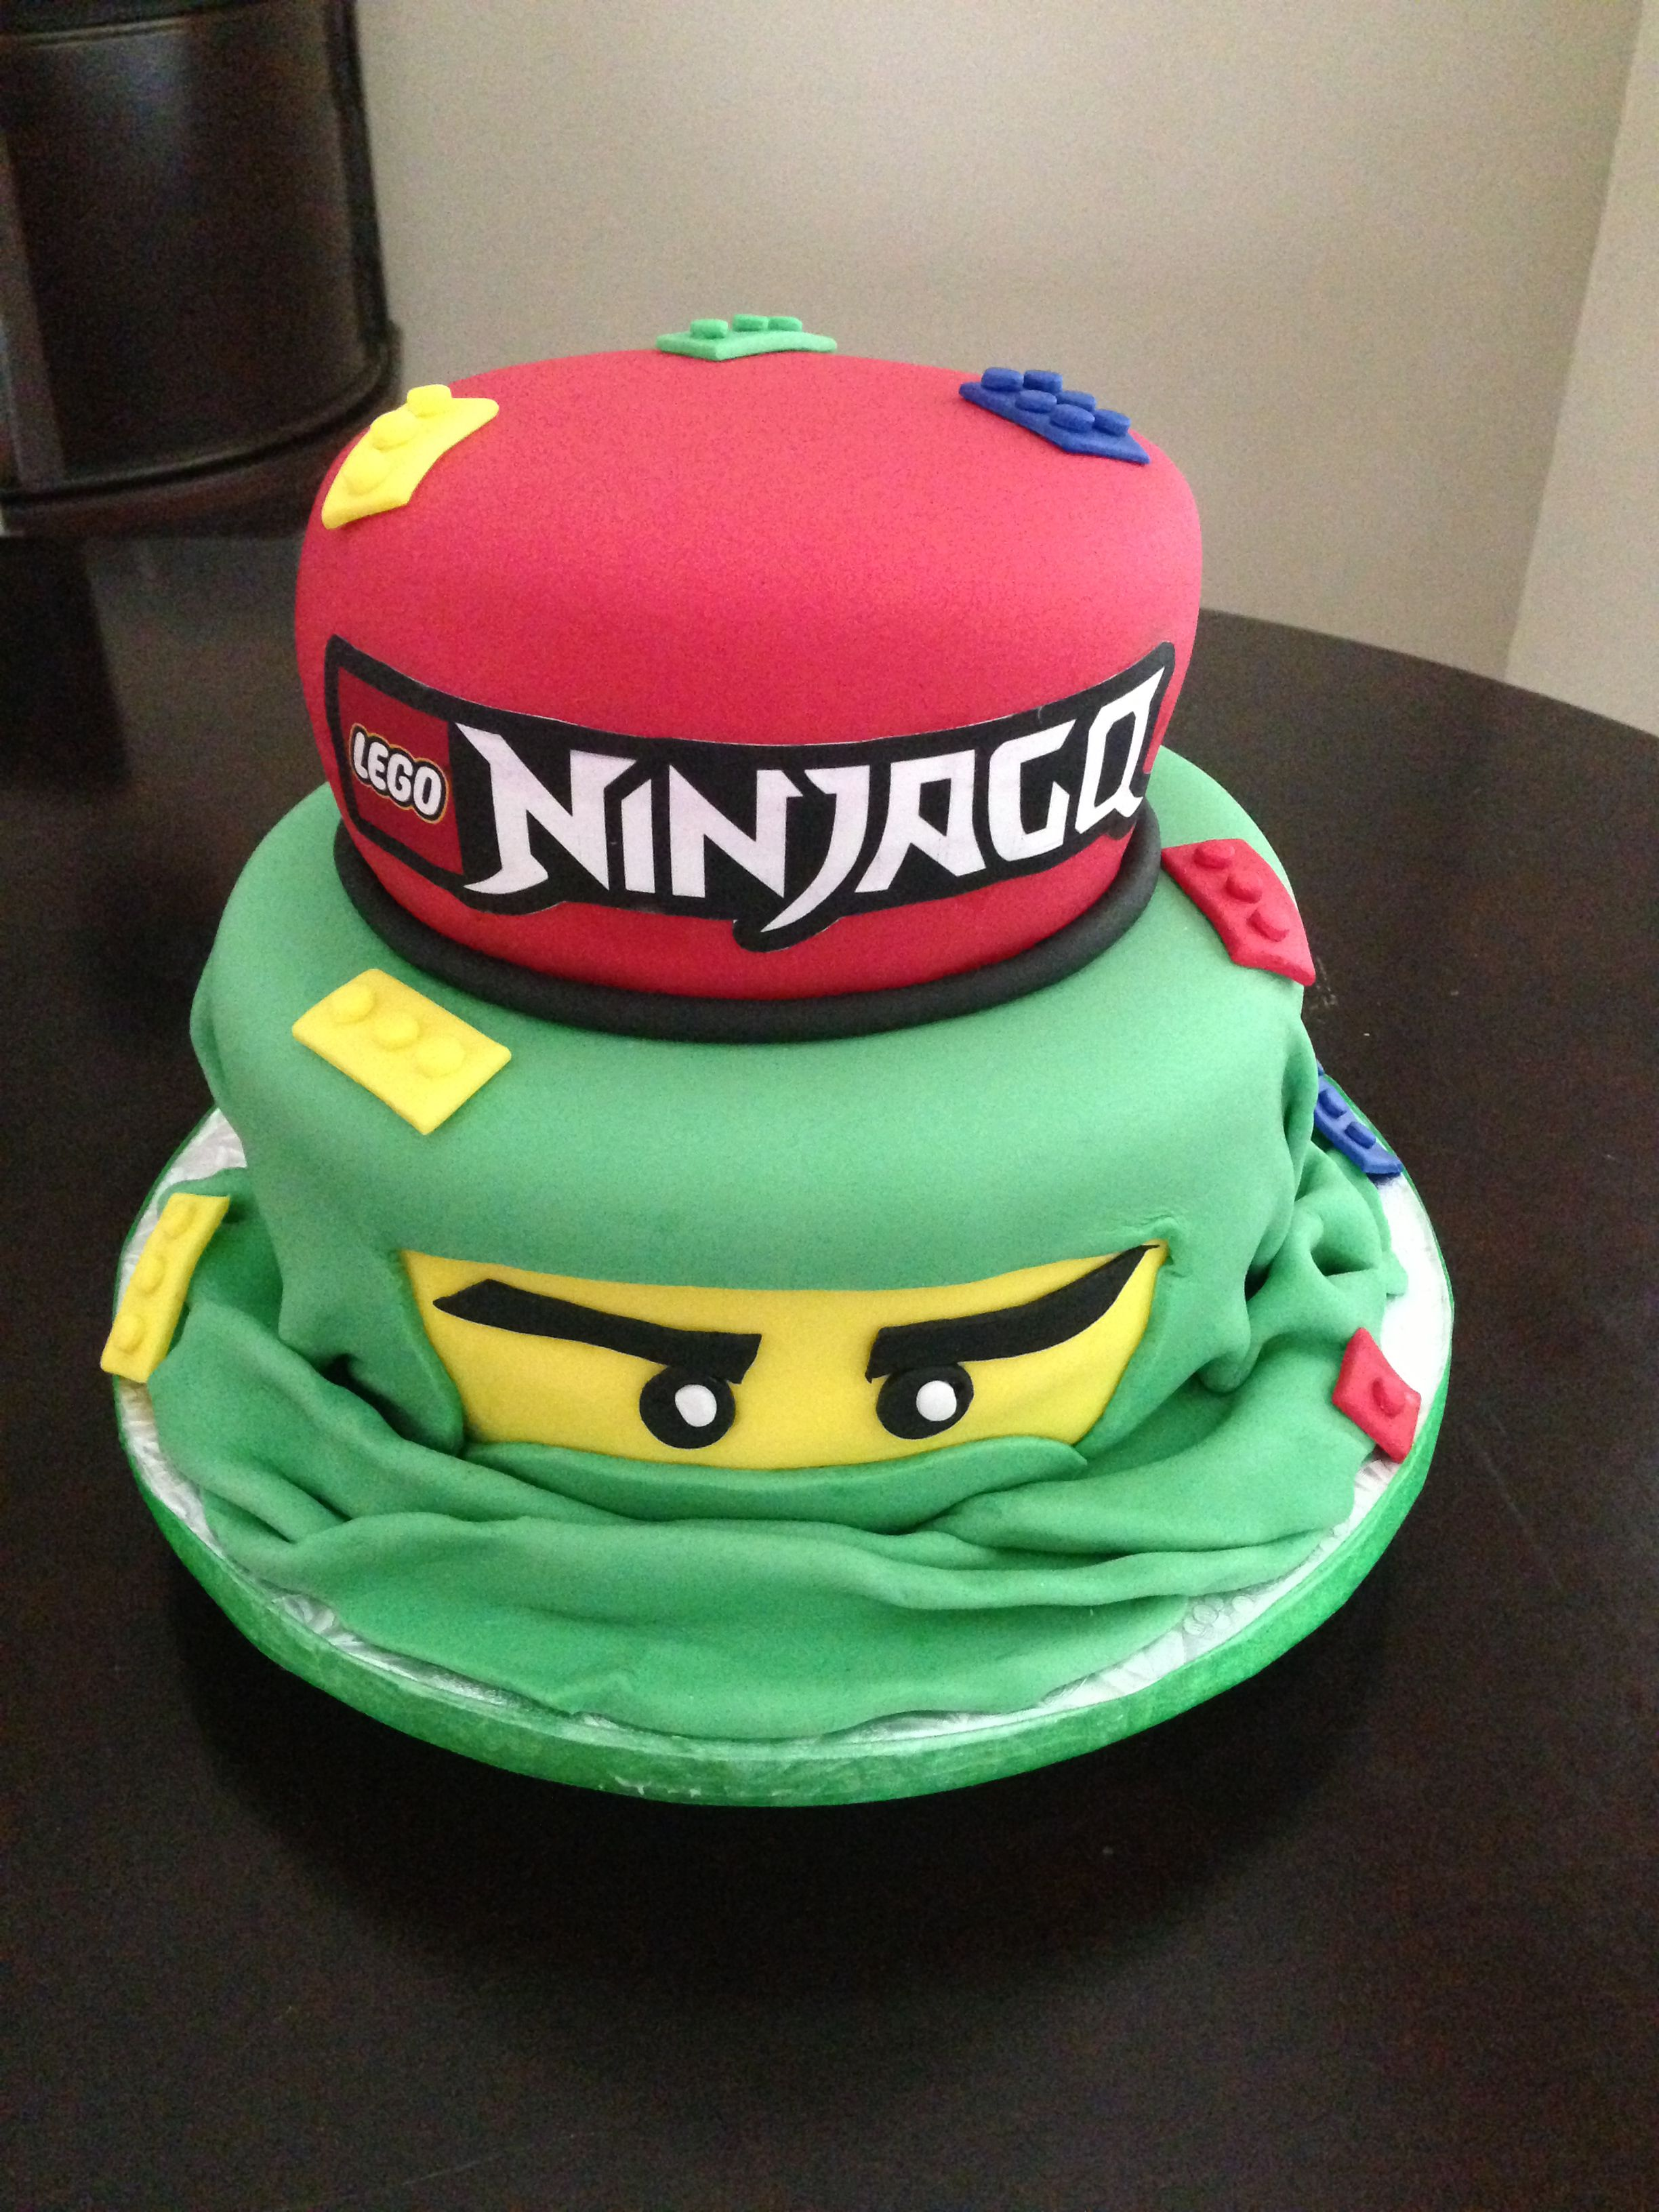 Ninjago Birthday Cake Lego Ninjago Cake Birthday